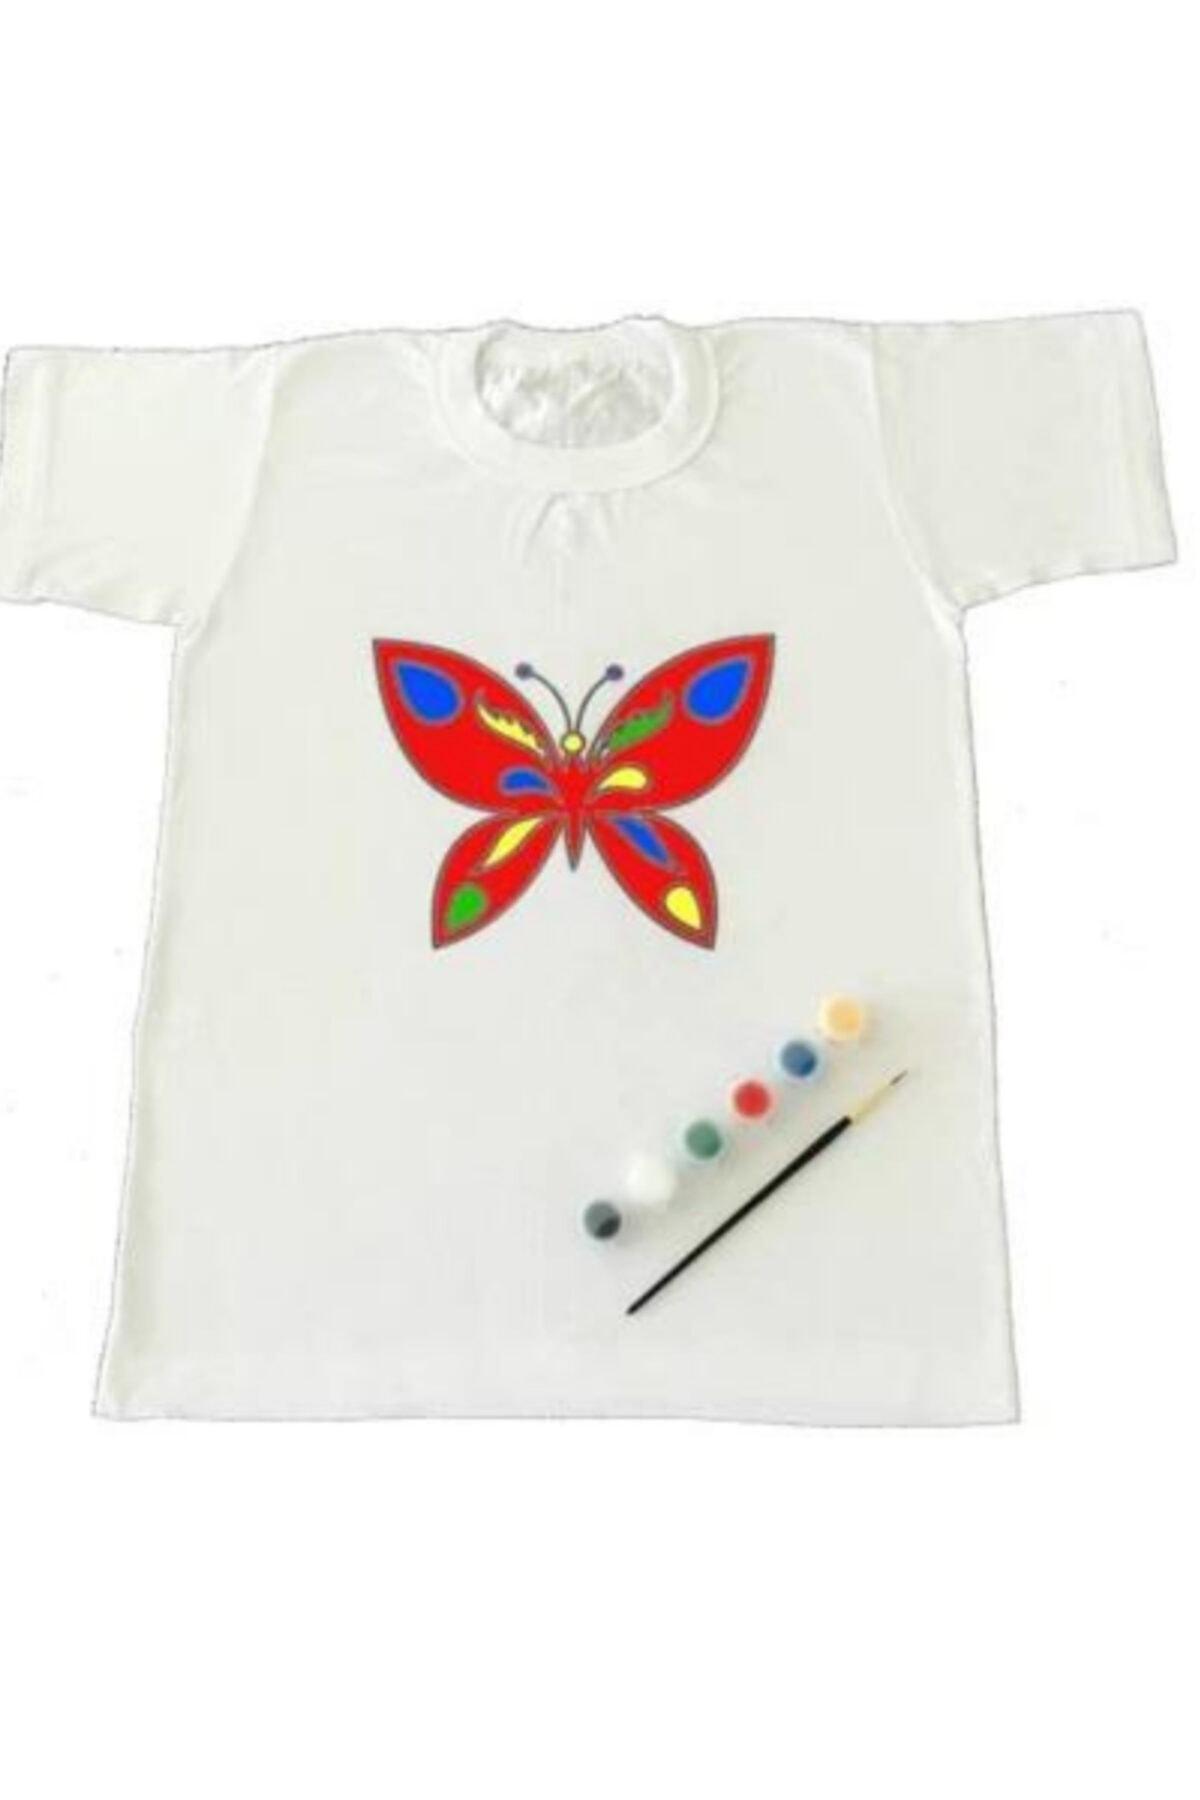 Joy and Toys Kelebek Desenli T-shirt Boyama Seti 4-5 Yaş Çocuk Aktivite 2